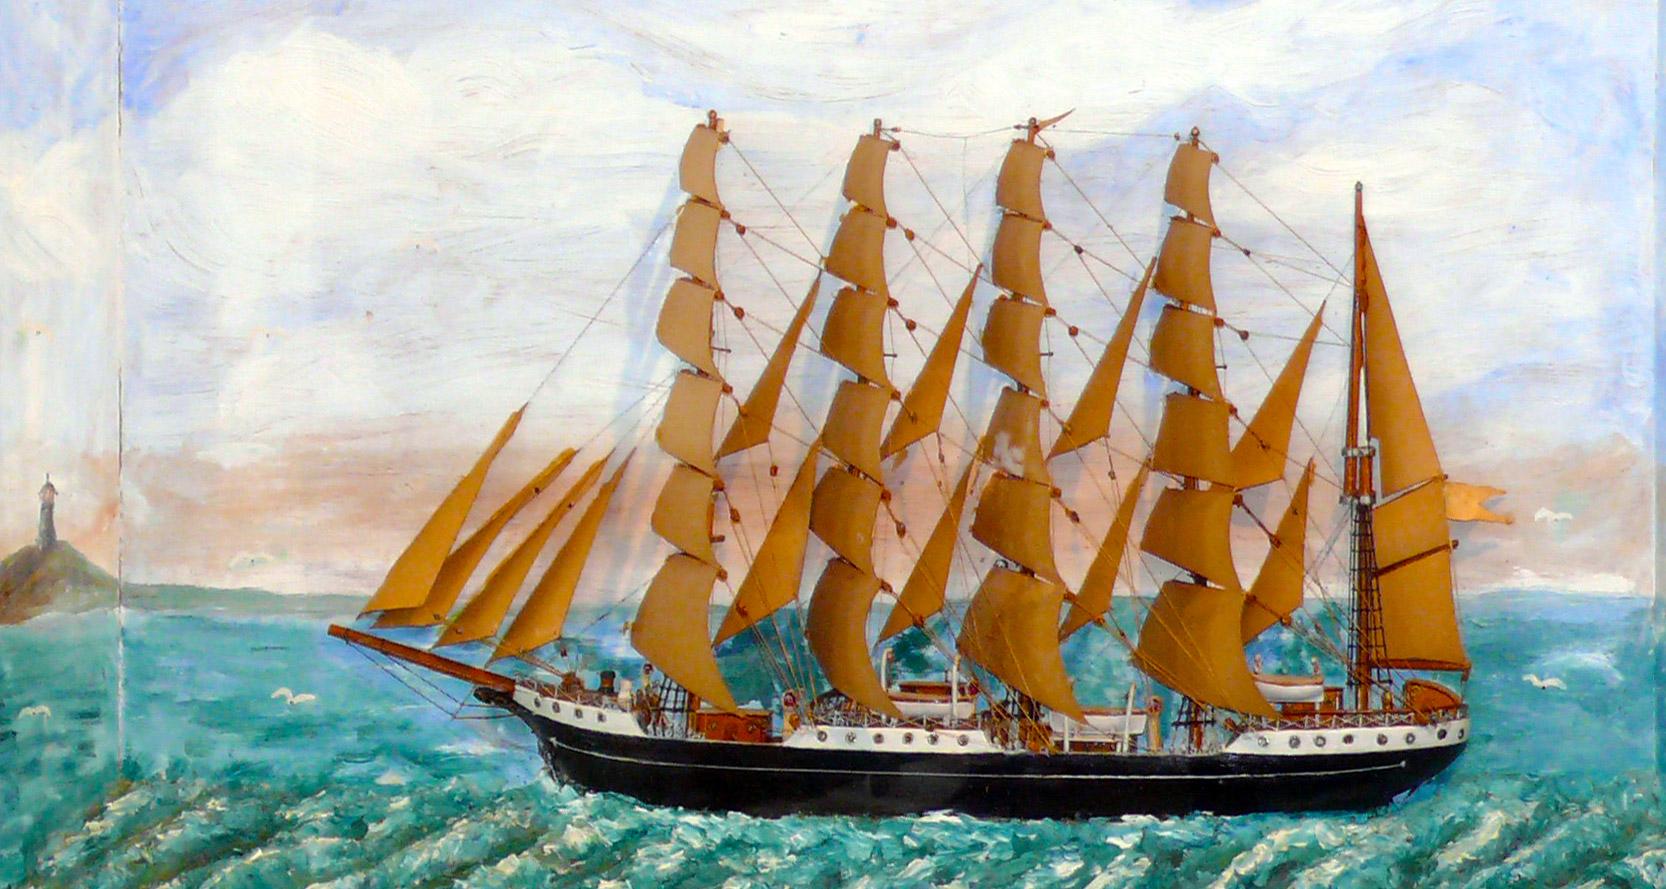 Schulschiff København